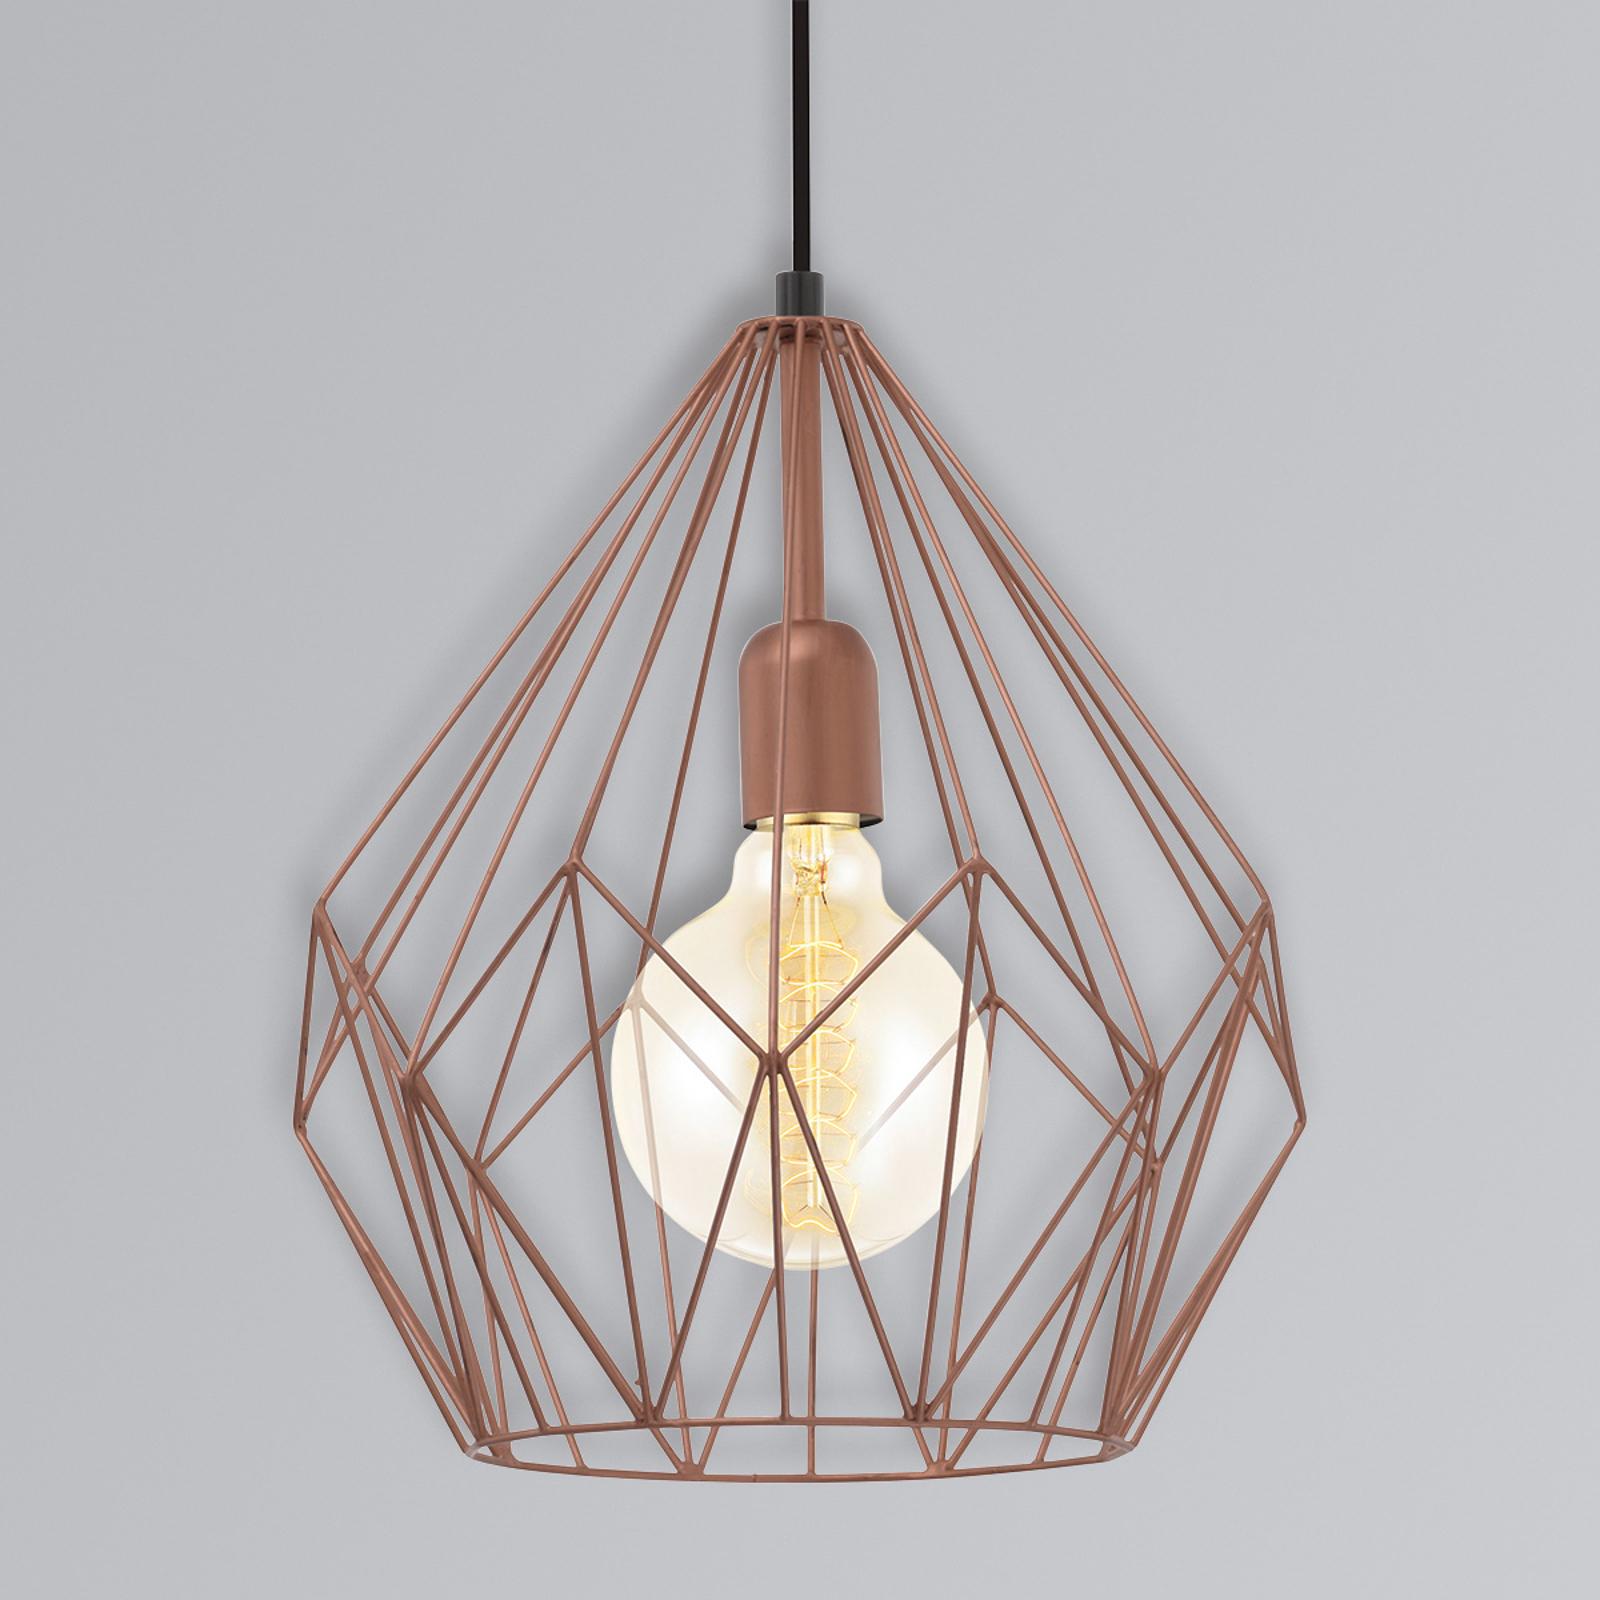 Carlton - una lampada a pendolo in stile vintage